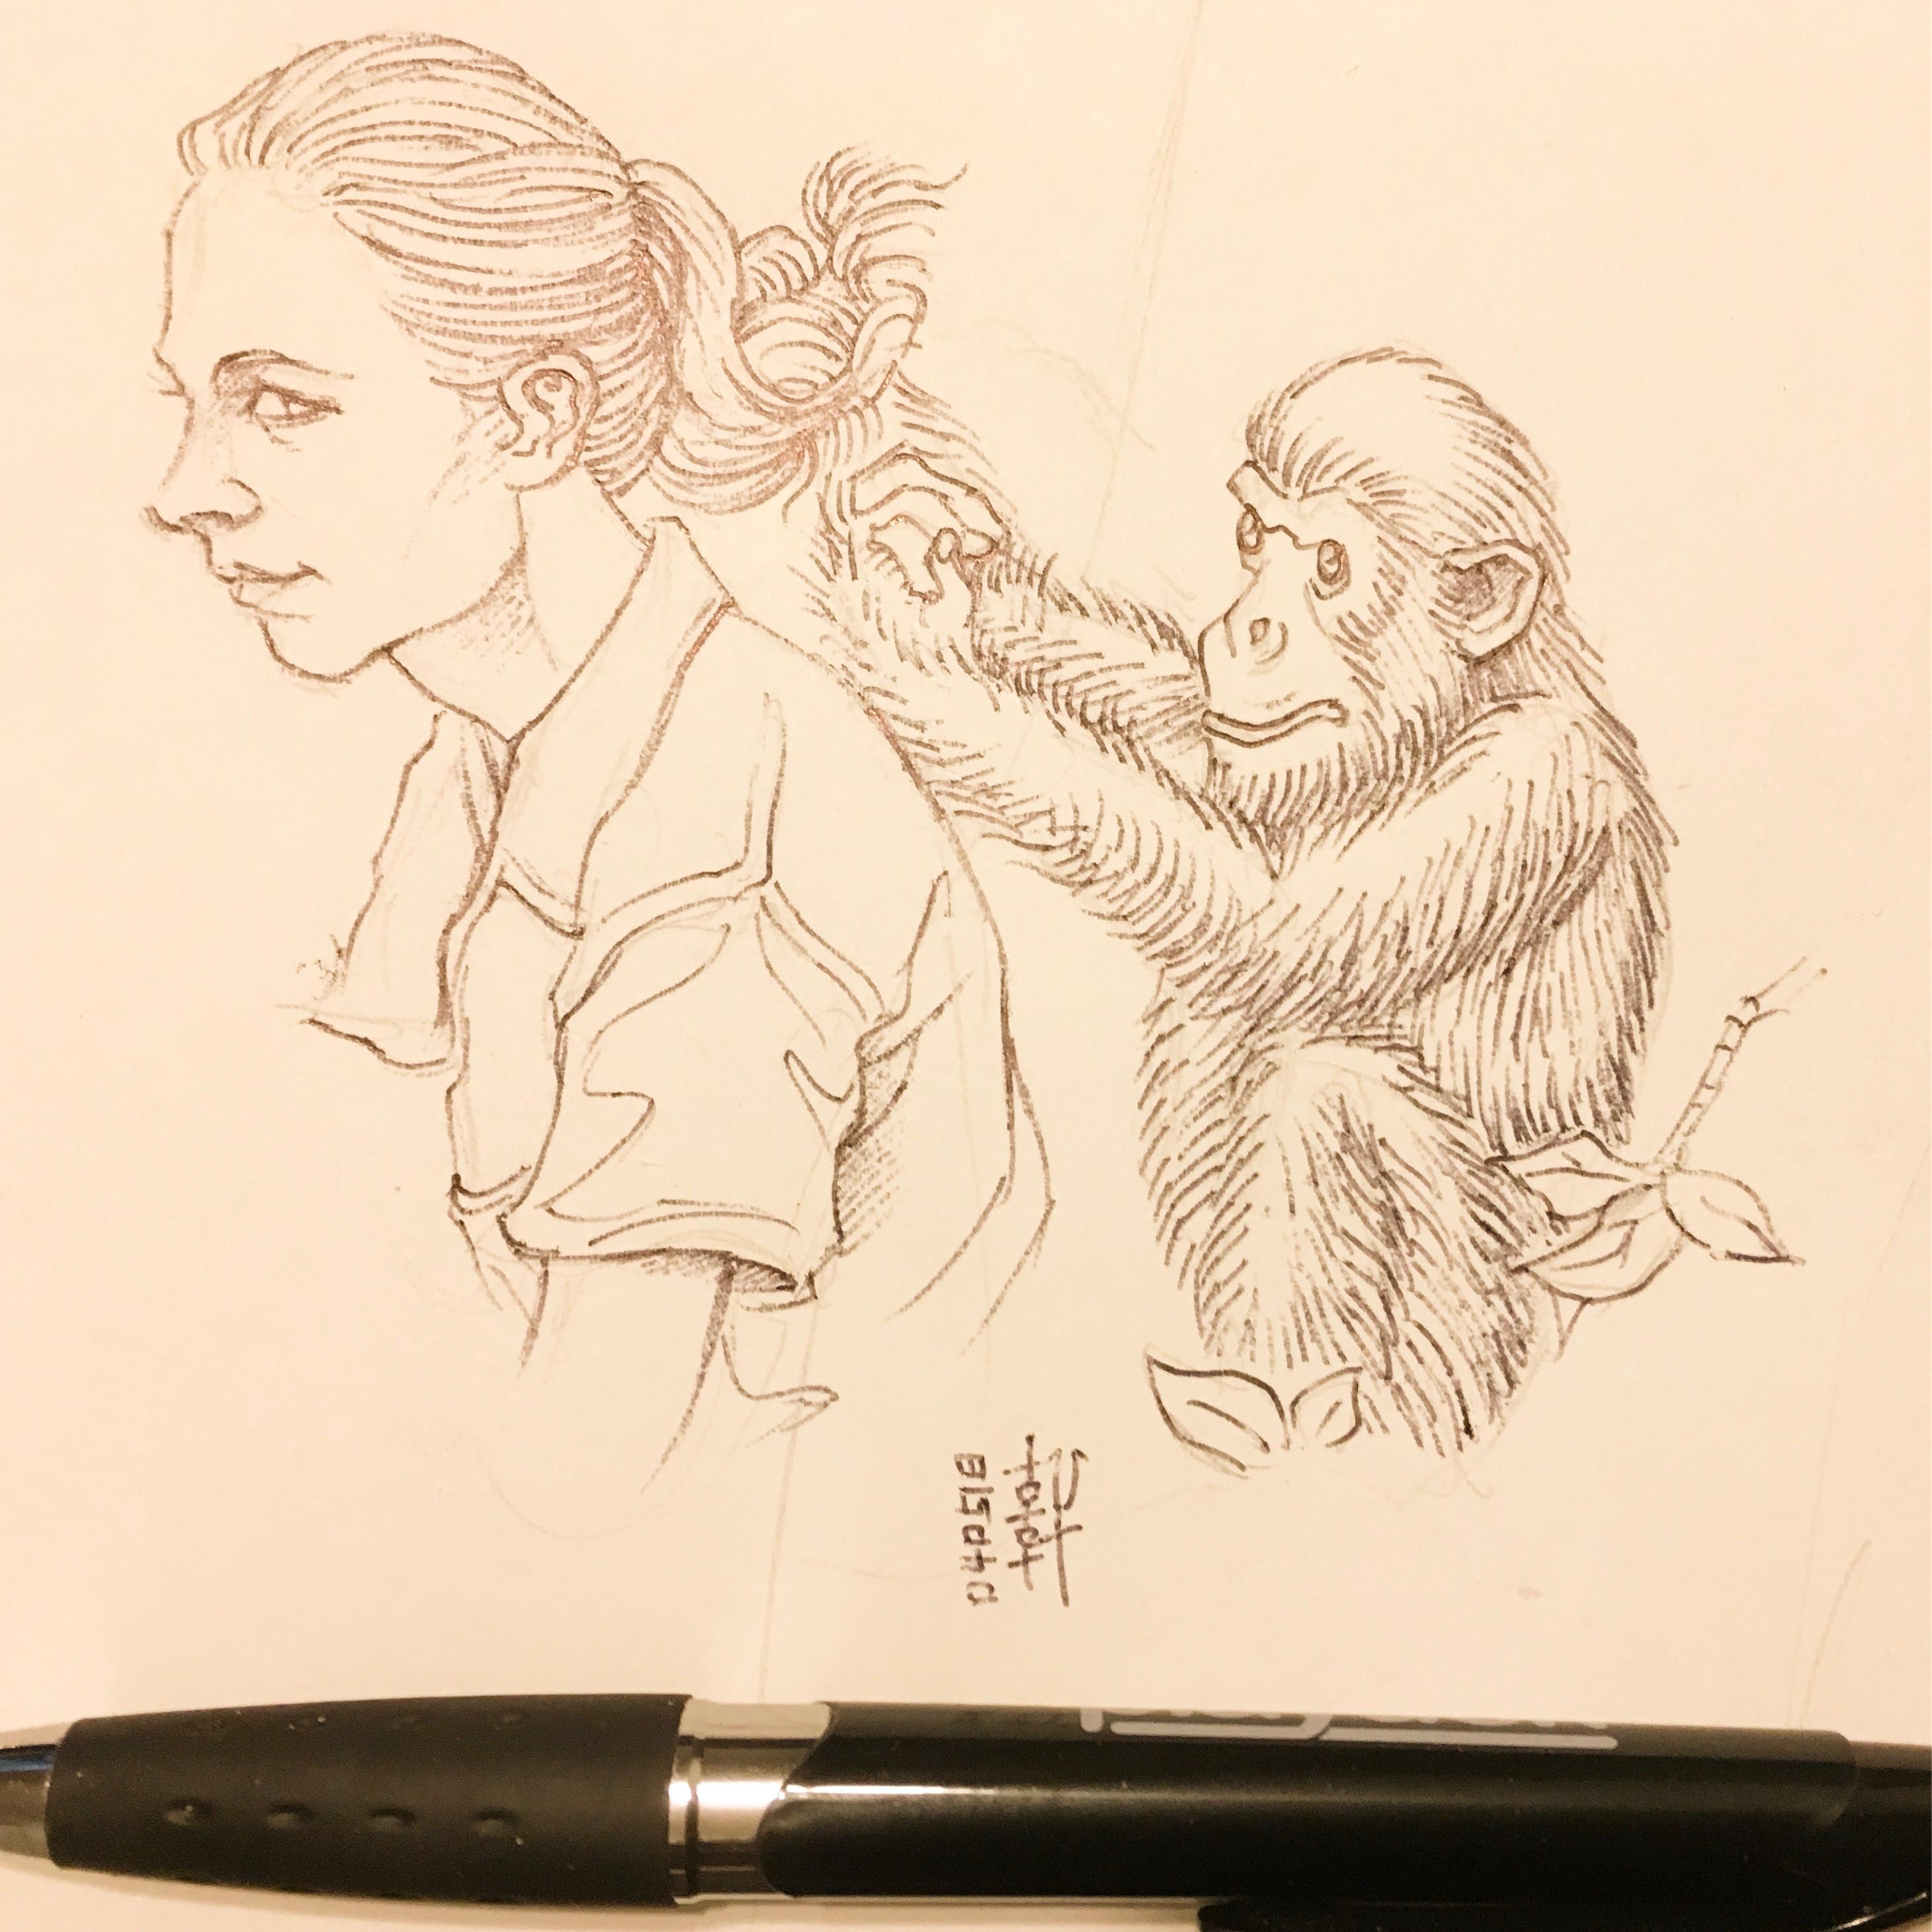 Day 04-05-18 - Jane Goodall